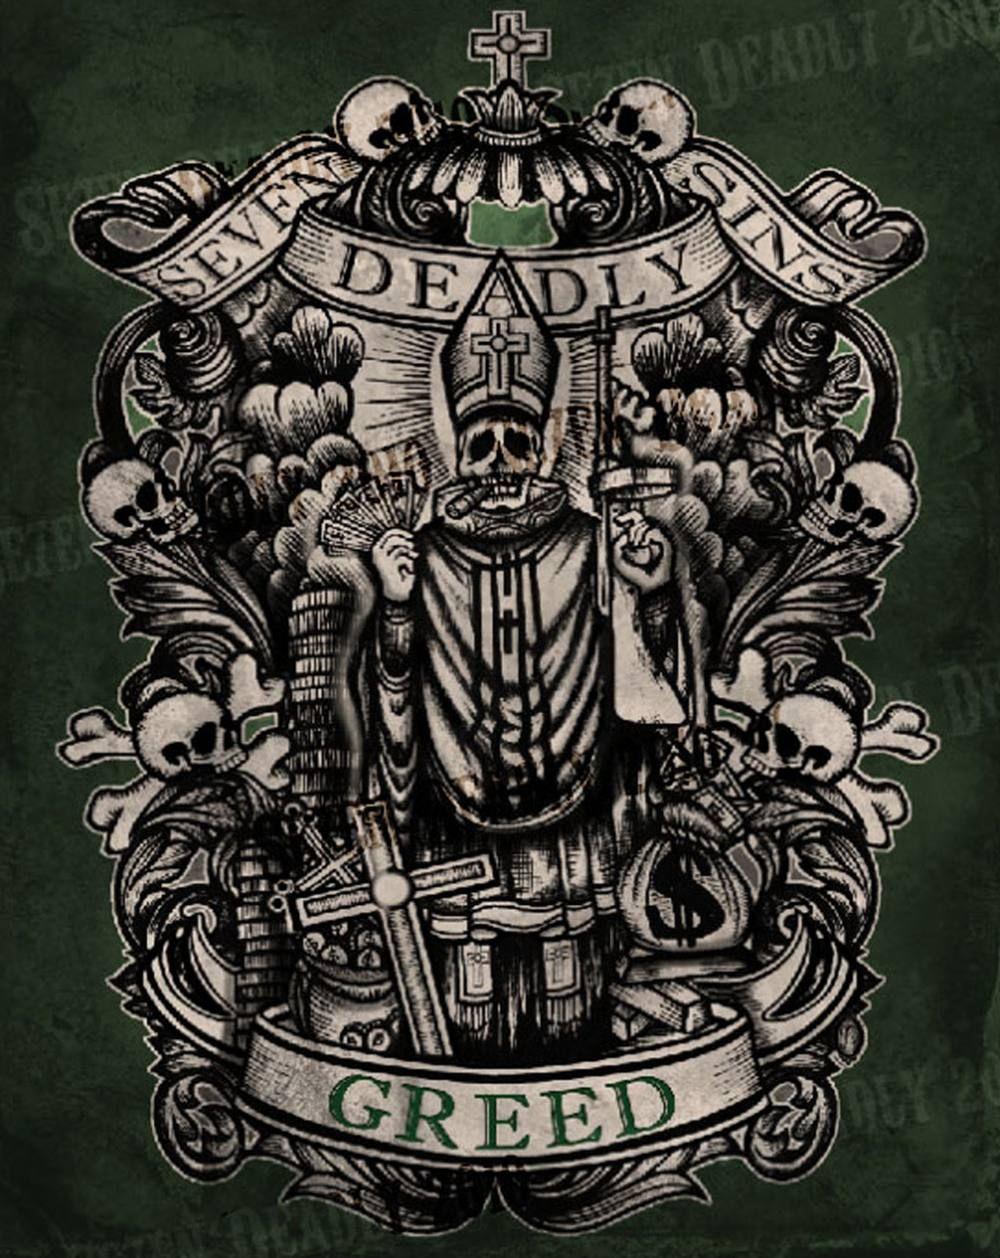 Se7en Deadly Deadly Greed Print 11x14 Outgoing Pinterest